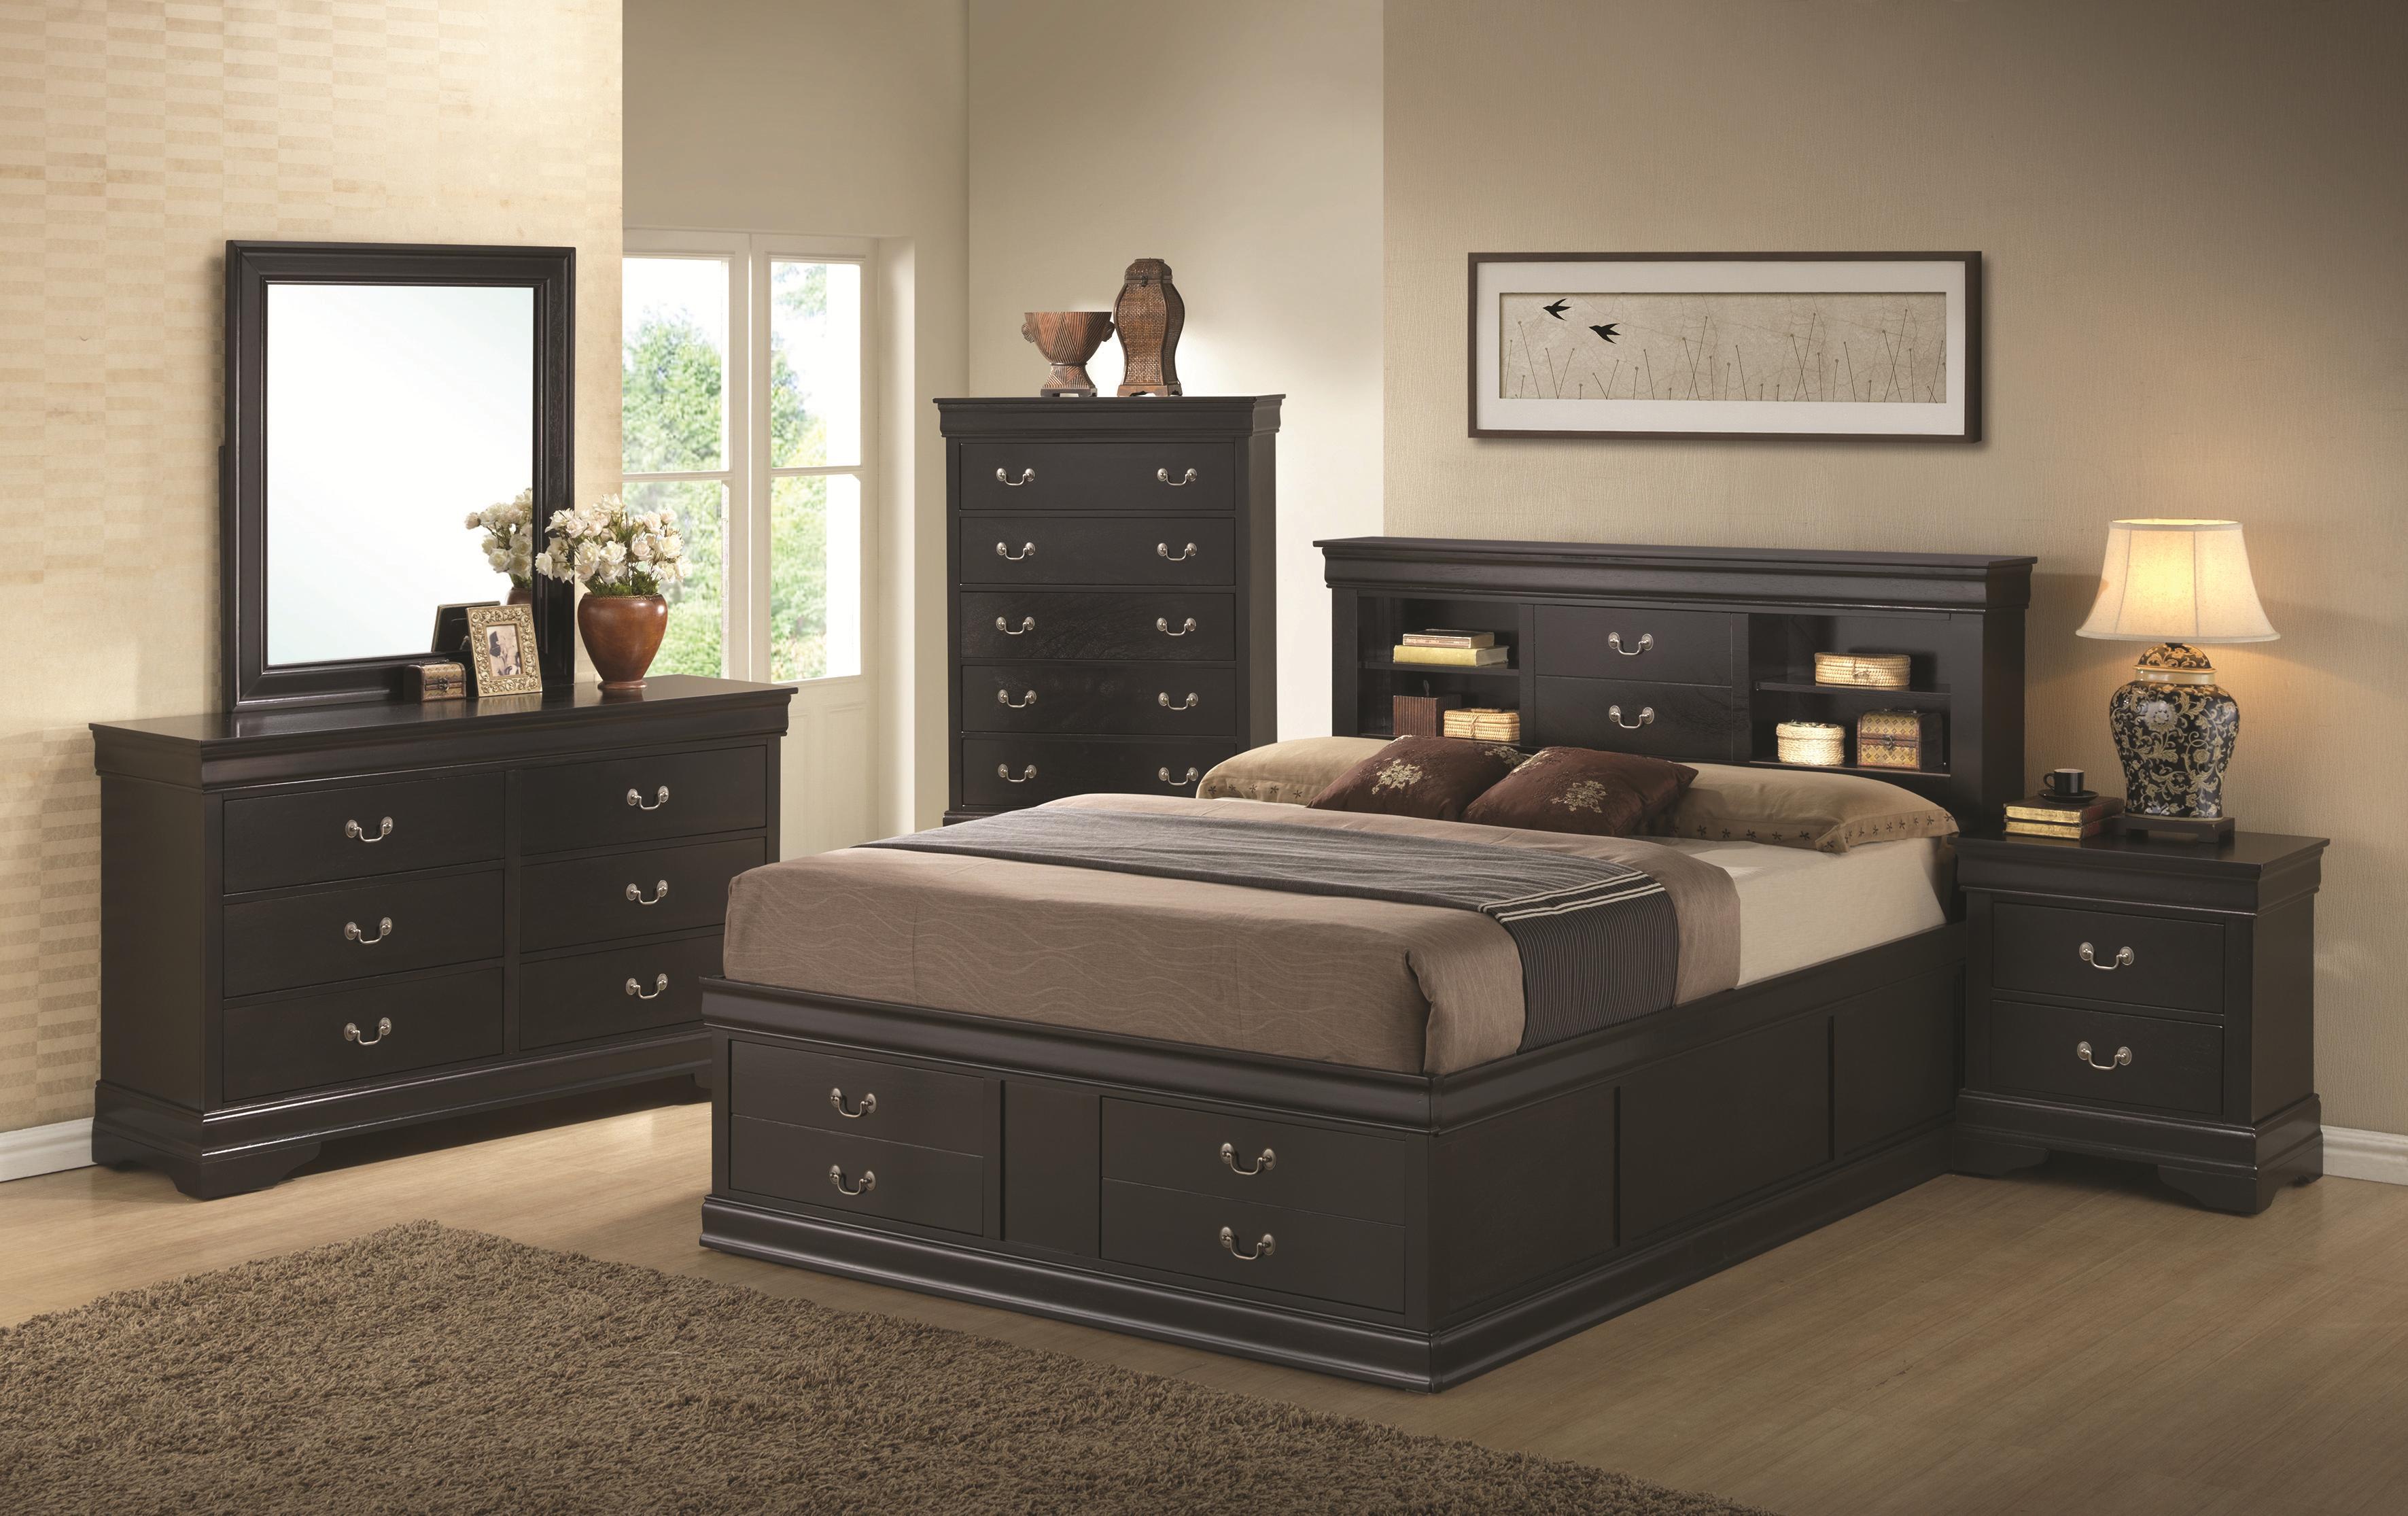 Coaster Louis Philippe King Bedroom Group - Item Number: 203960B K Bedroom Group 1